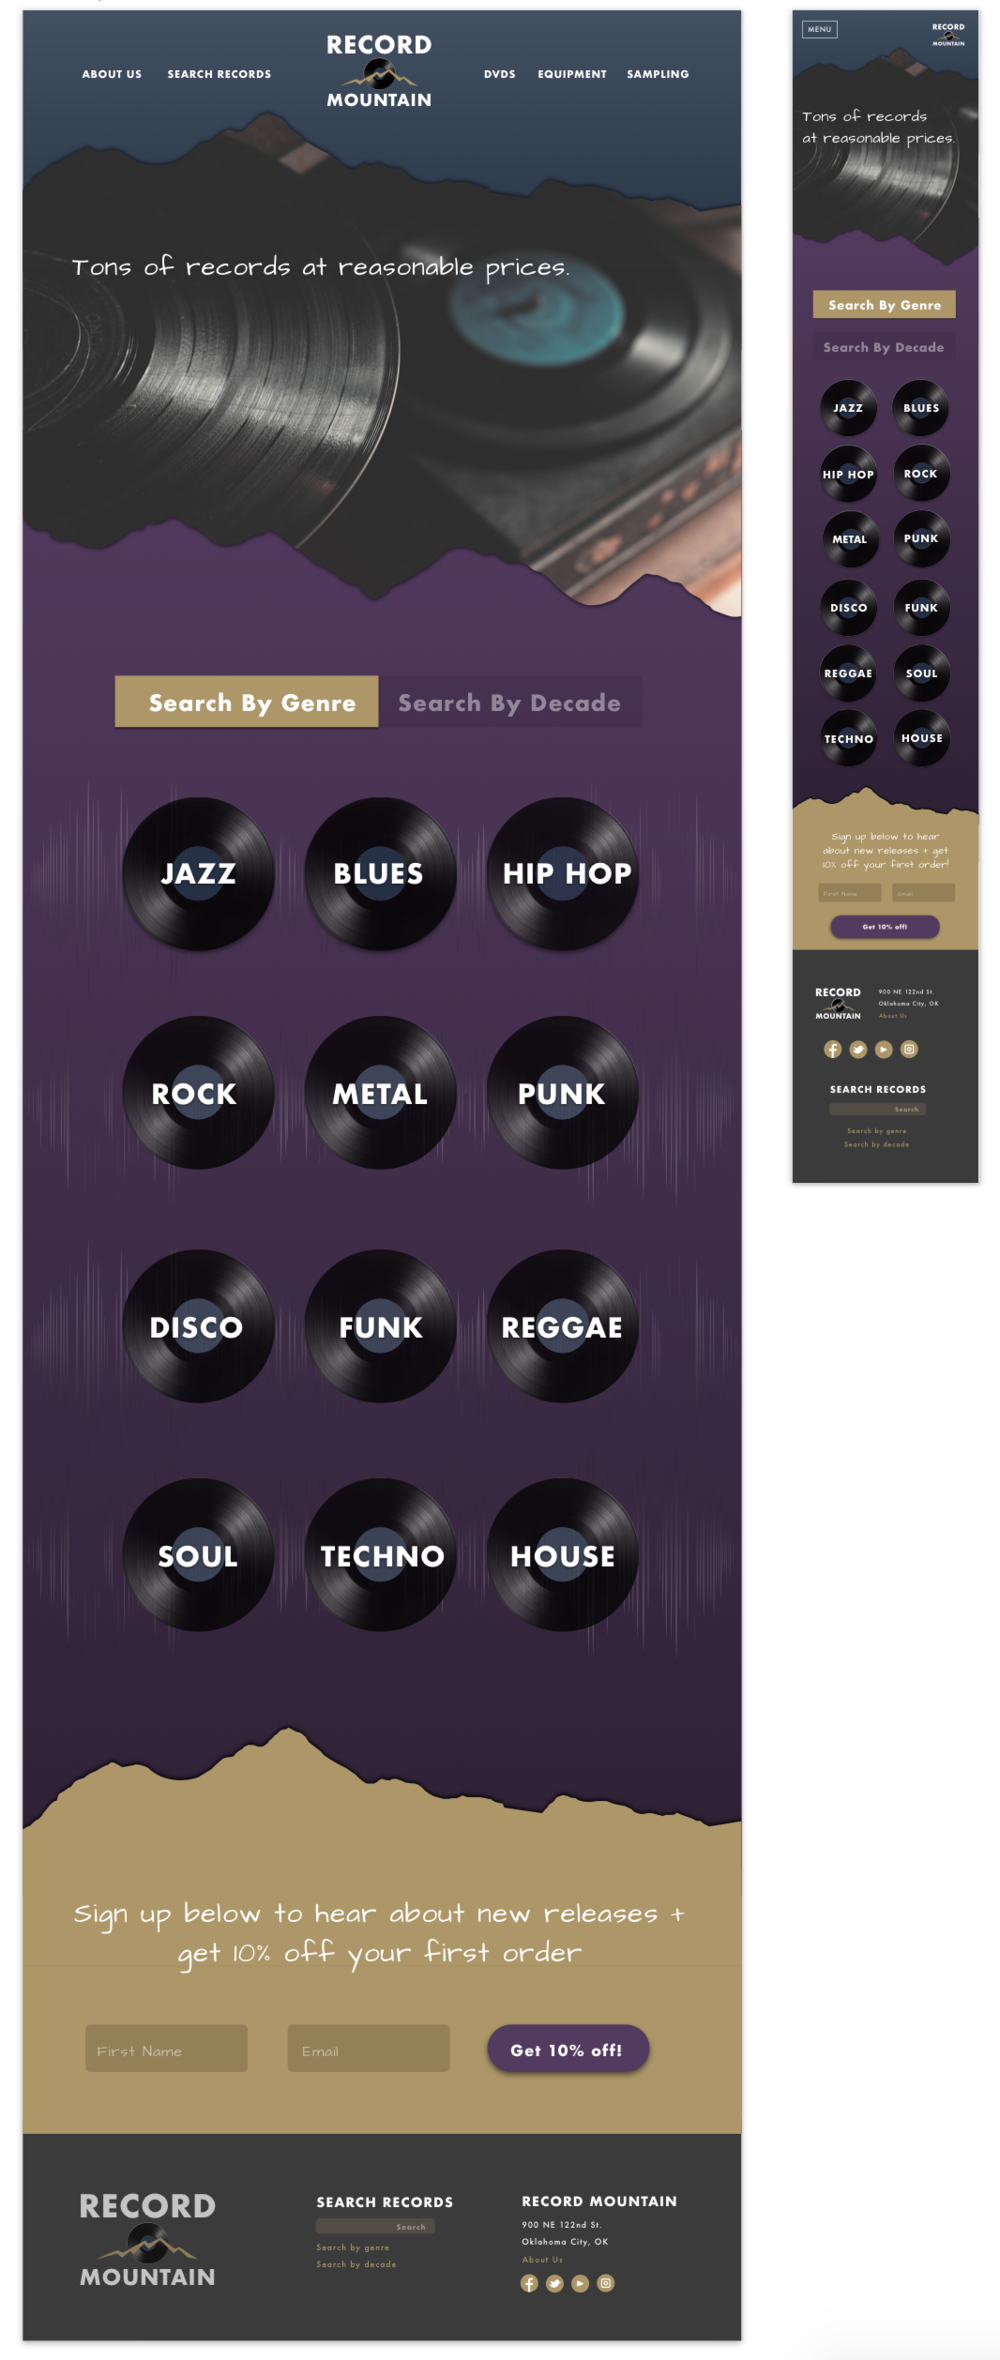 Record-Mountain-Homepage-Design